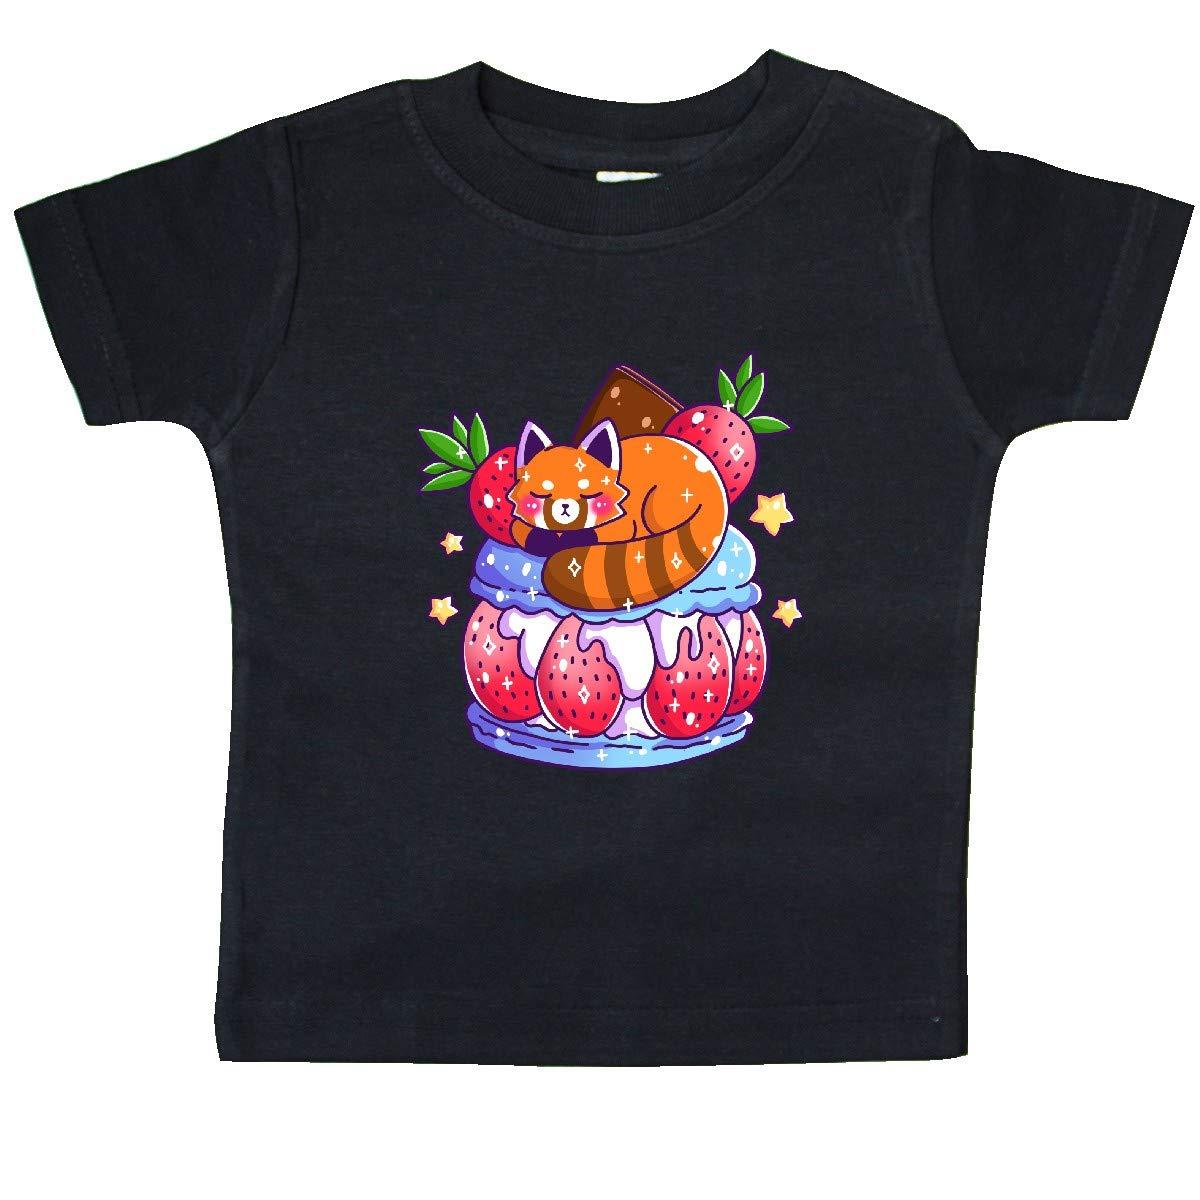 inktastic Cute Red Panda Sleeping on Macaron with Strawberries Baby T-Shirt